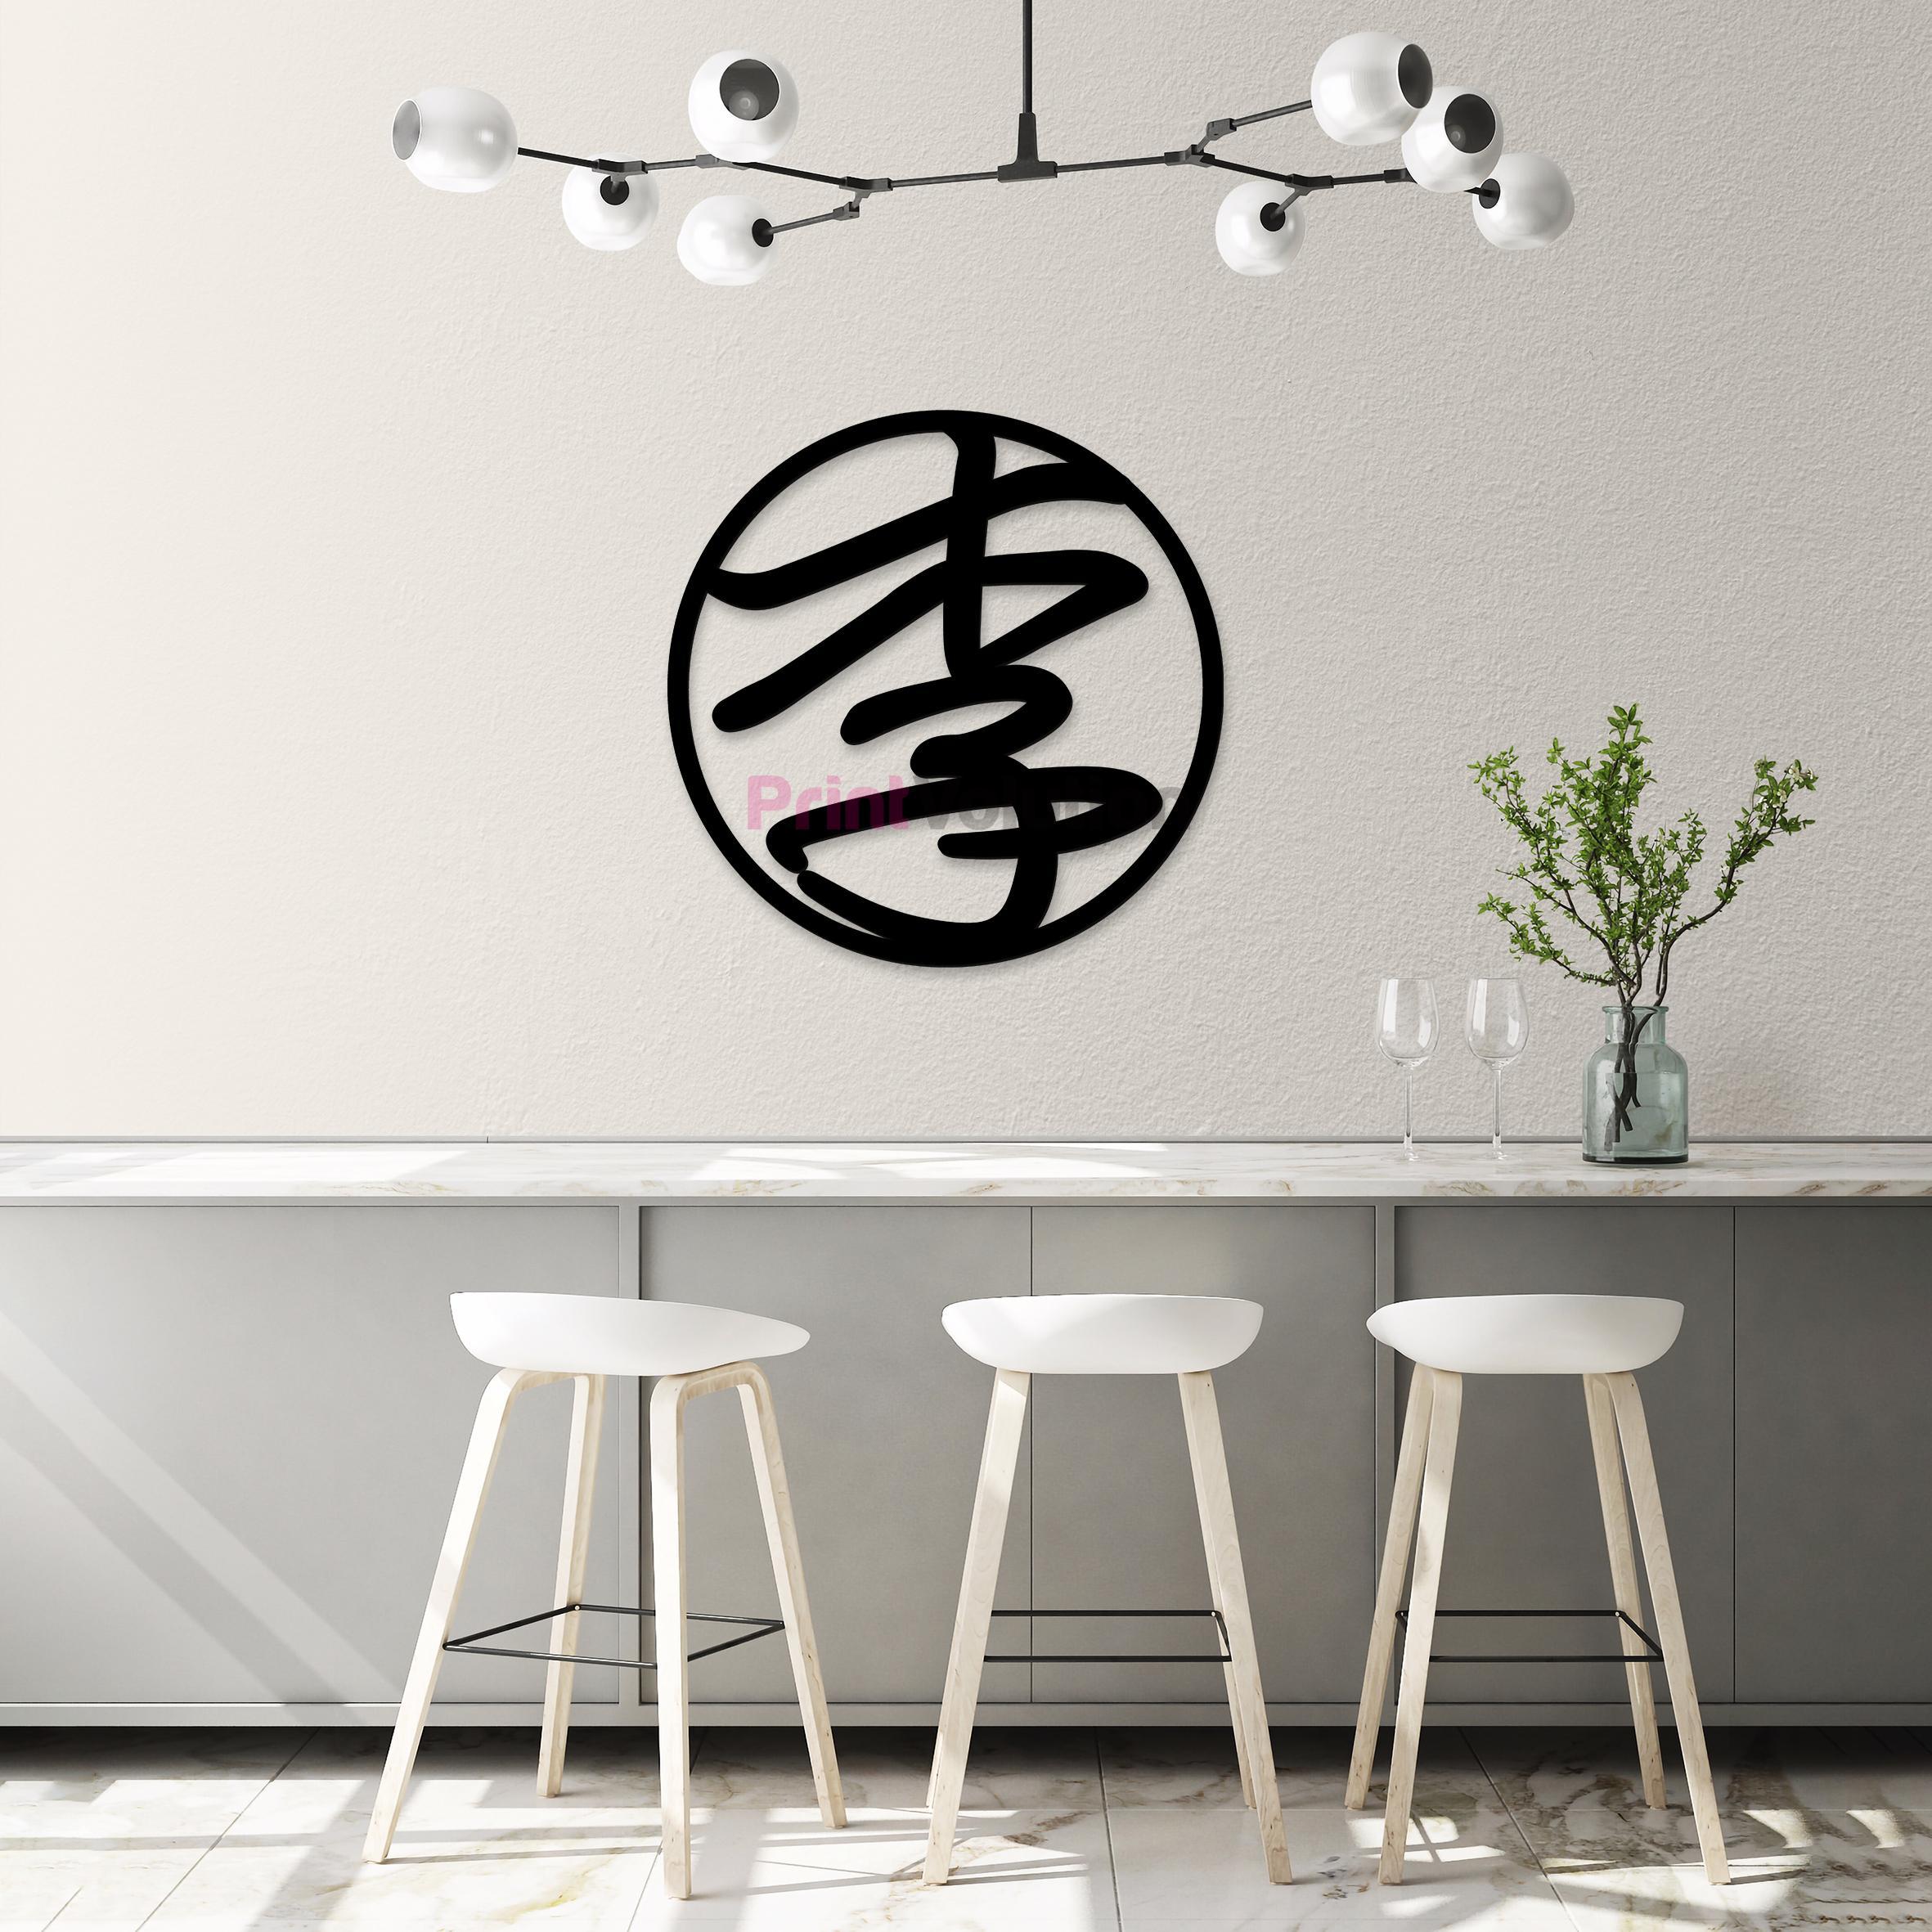 Li Family Wall Art Signage - Black Acrylic